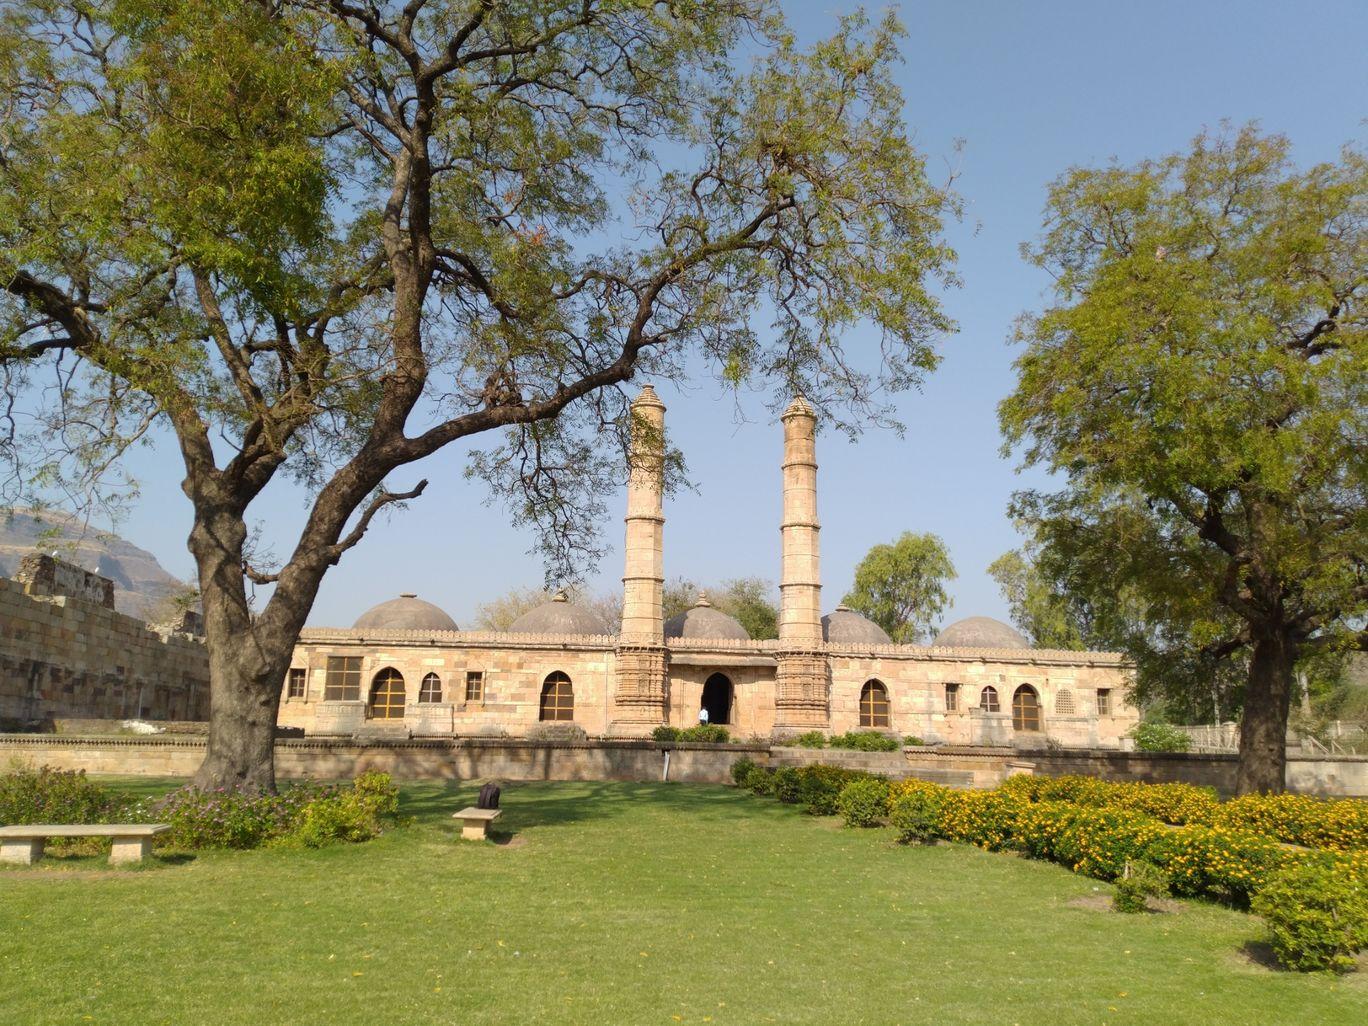 Photo of Champaner-Pavagadh Archaeological Park By Deepak Singh